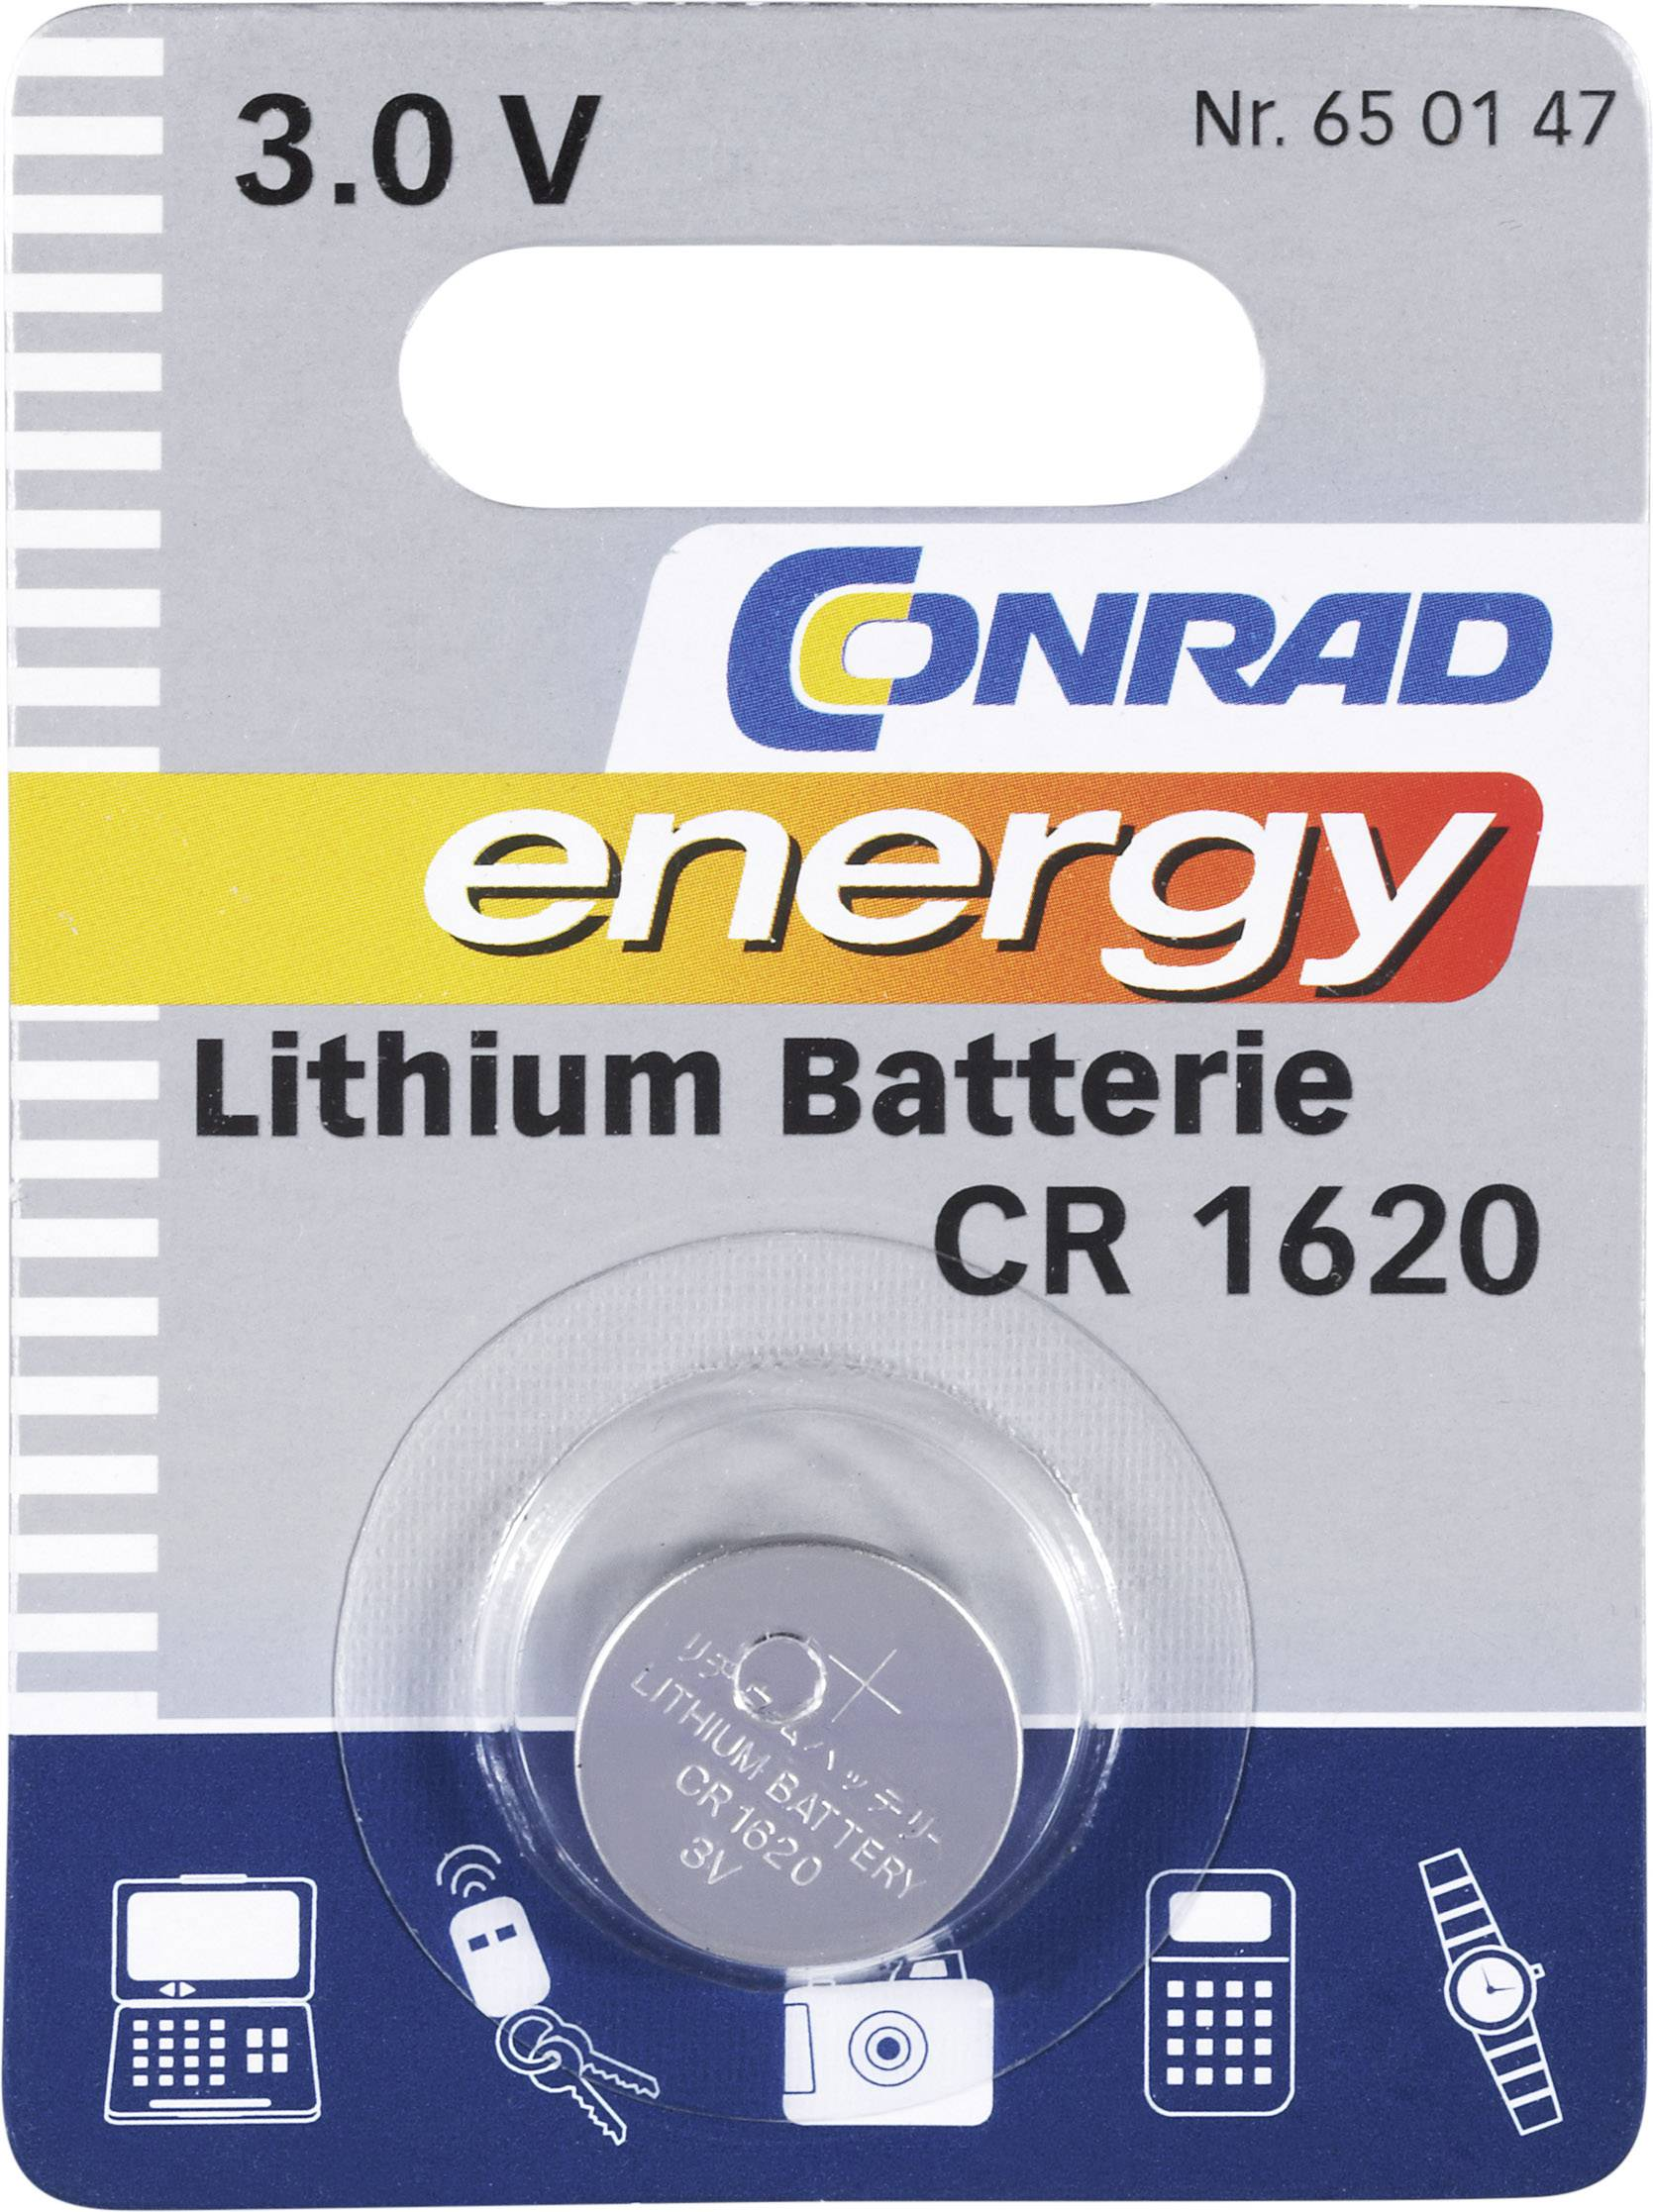 Knoflíková baterie Conrad energy CR 1620, lithium